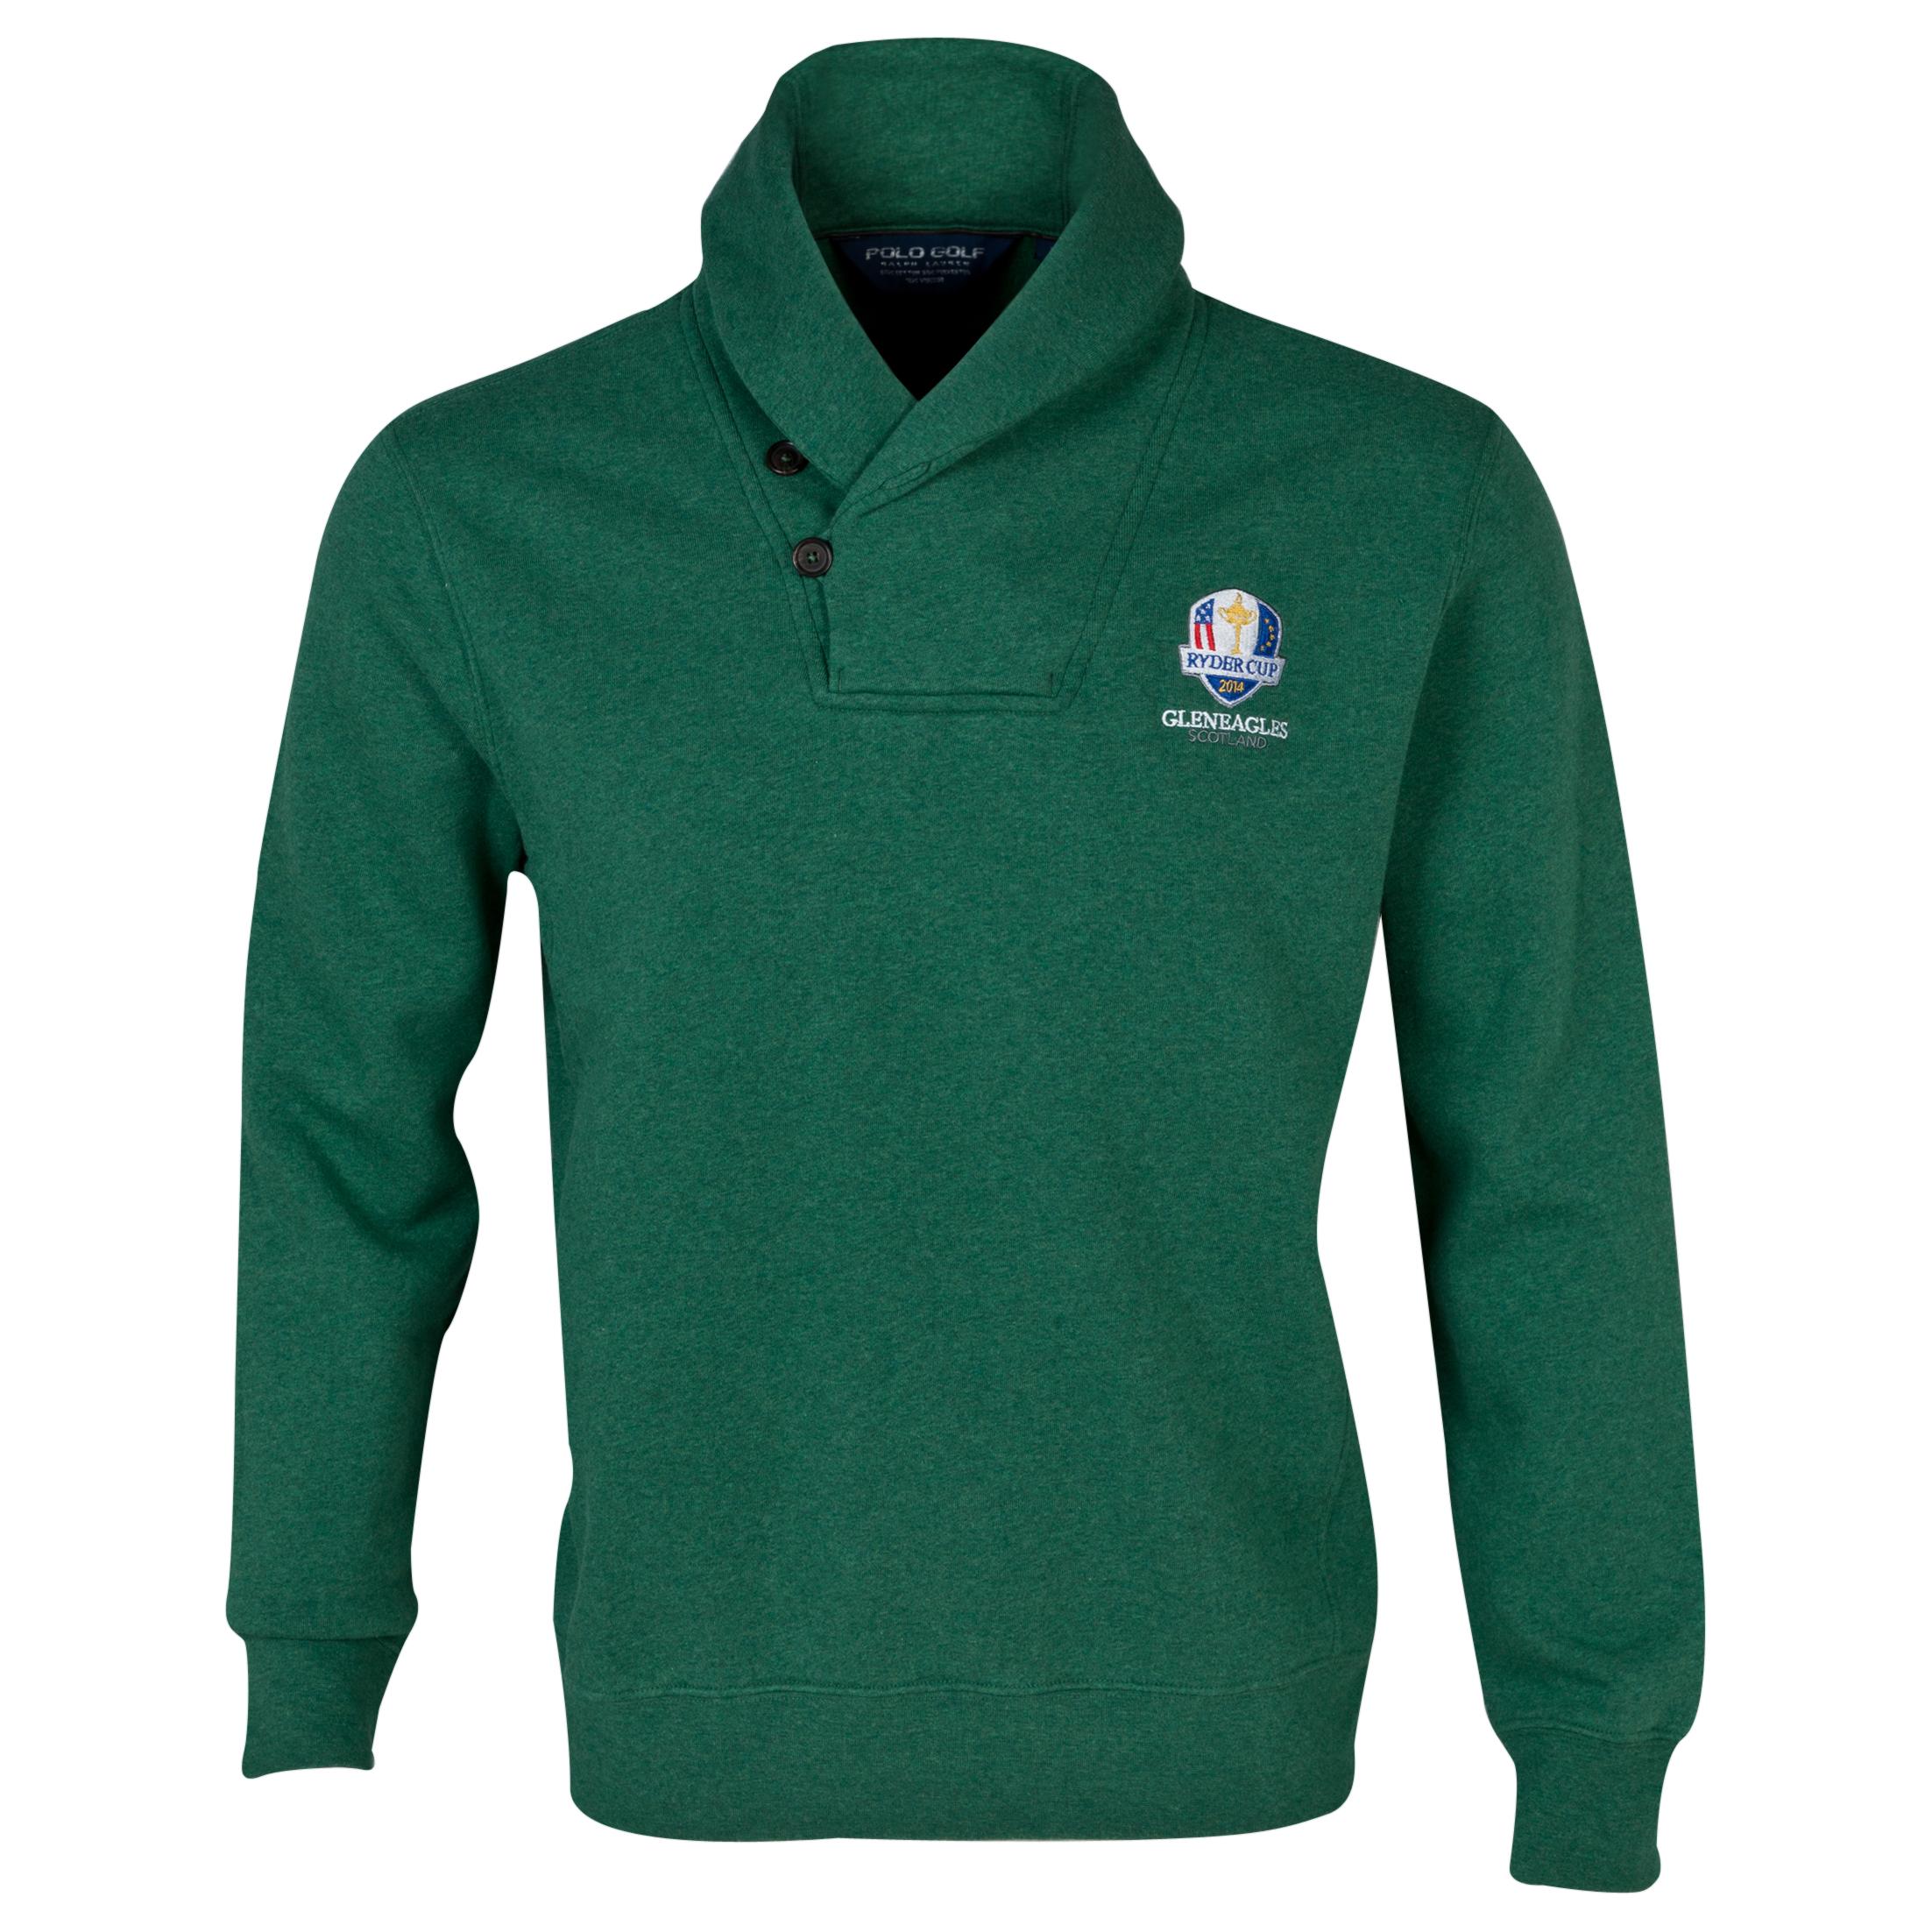 The 2014 Ryder Cup Ralph Lauren Shawl Collar Sweater Green